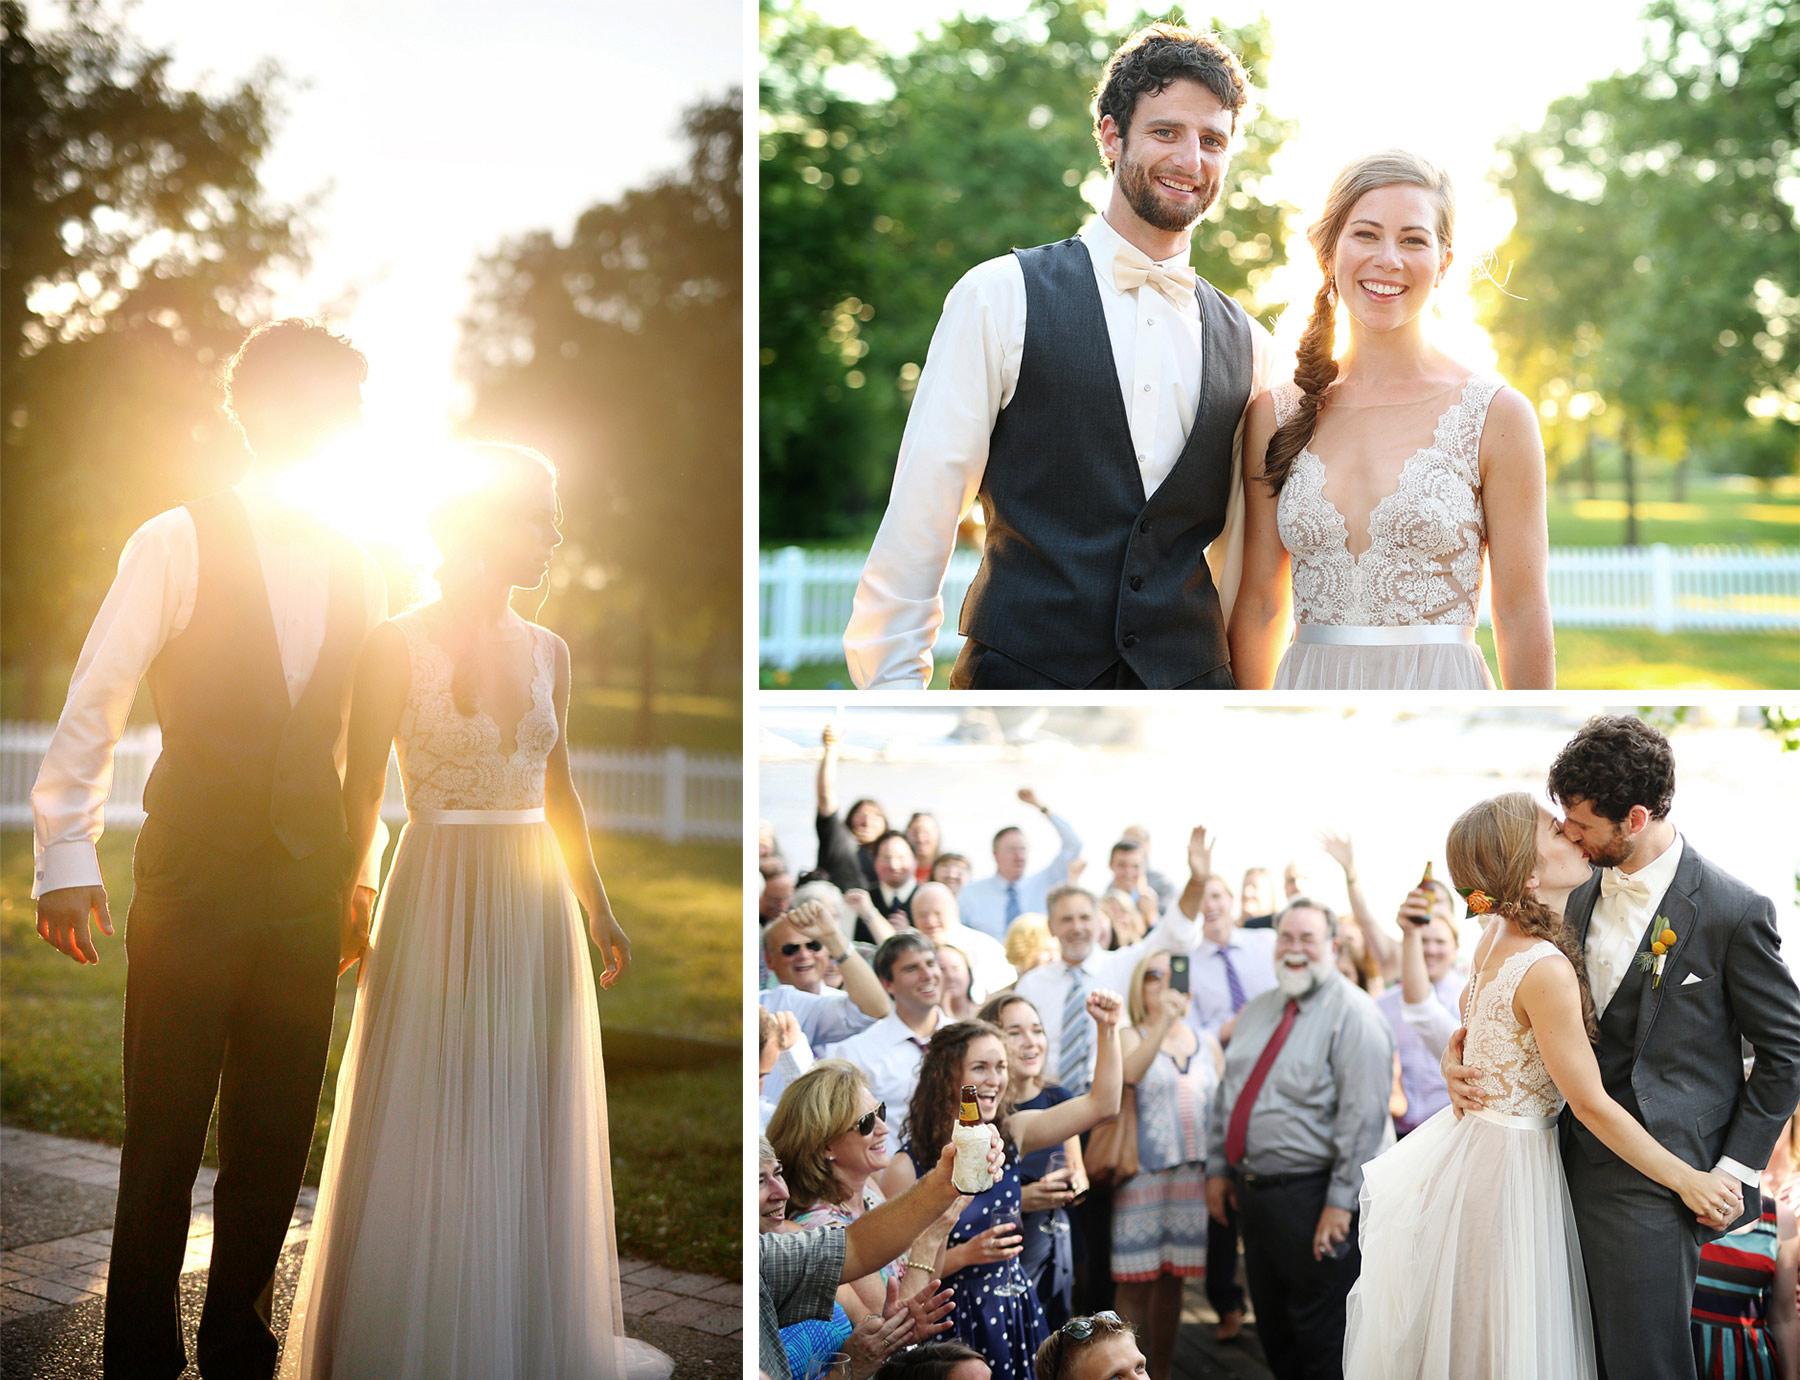 19-Minneapolis-Minnesota-Wedding-Photography-by-Vick-Photography-Downtown-Reception-Nicollet-Island-Pavillion-Sarah-&-Tom.jpg